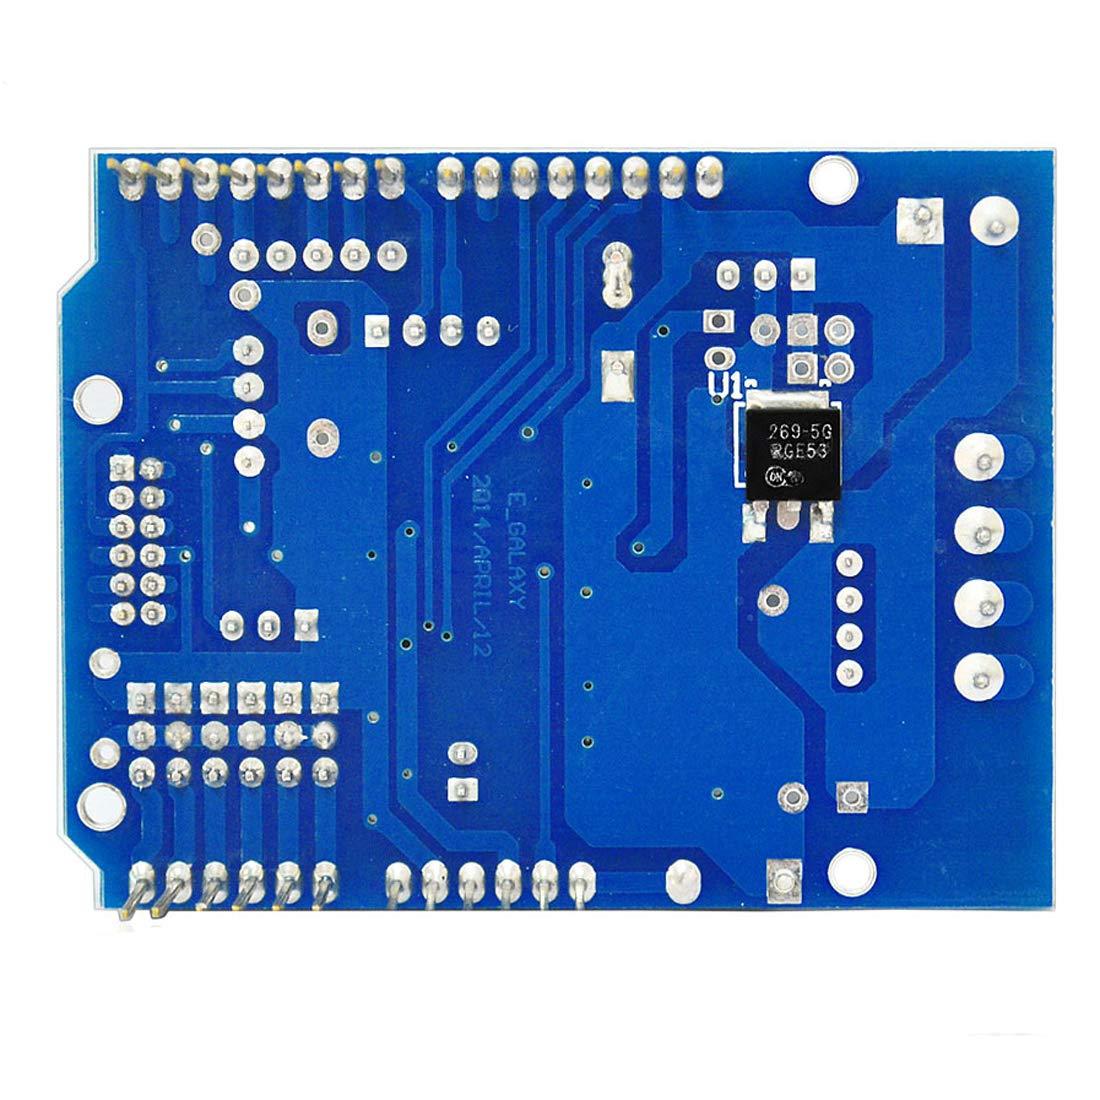 HiLetgo L298P DC Motor Drive Module L298P DC Motor Drive Shield H-Bridge Drive Expansion Board High-Power DC Stepper Motor Controller for Arduino